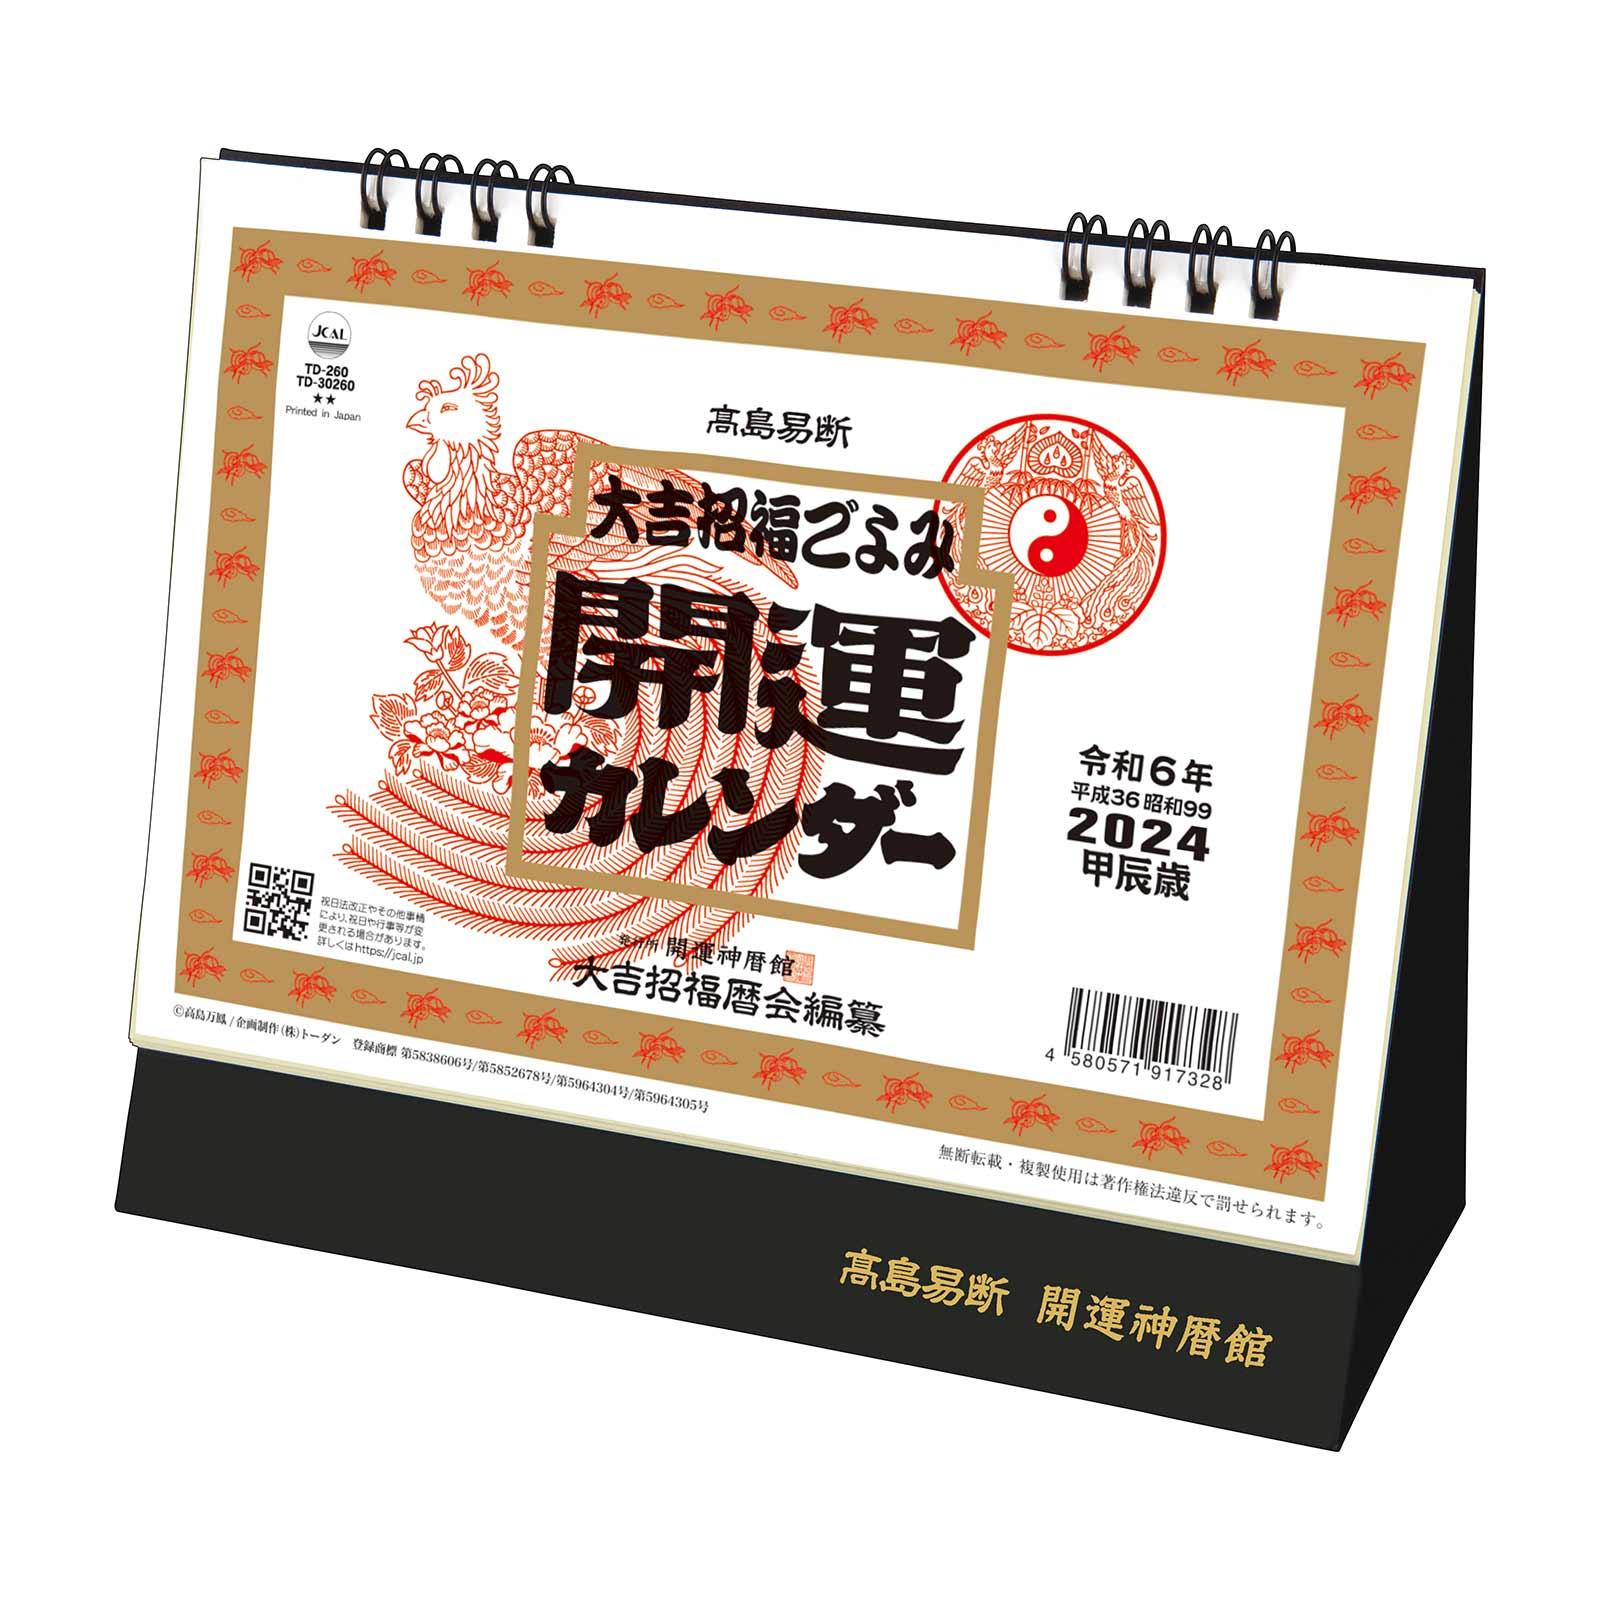 TD-30260(2022年版)<br>卓上L・開運カレンダー<br>【クリックポスト対応/代引き不可】